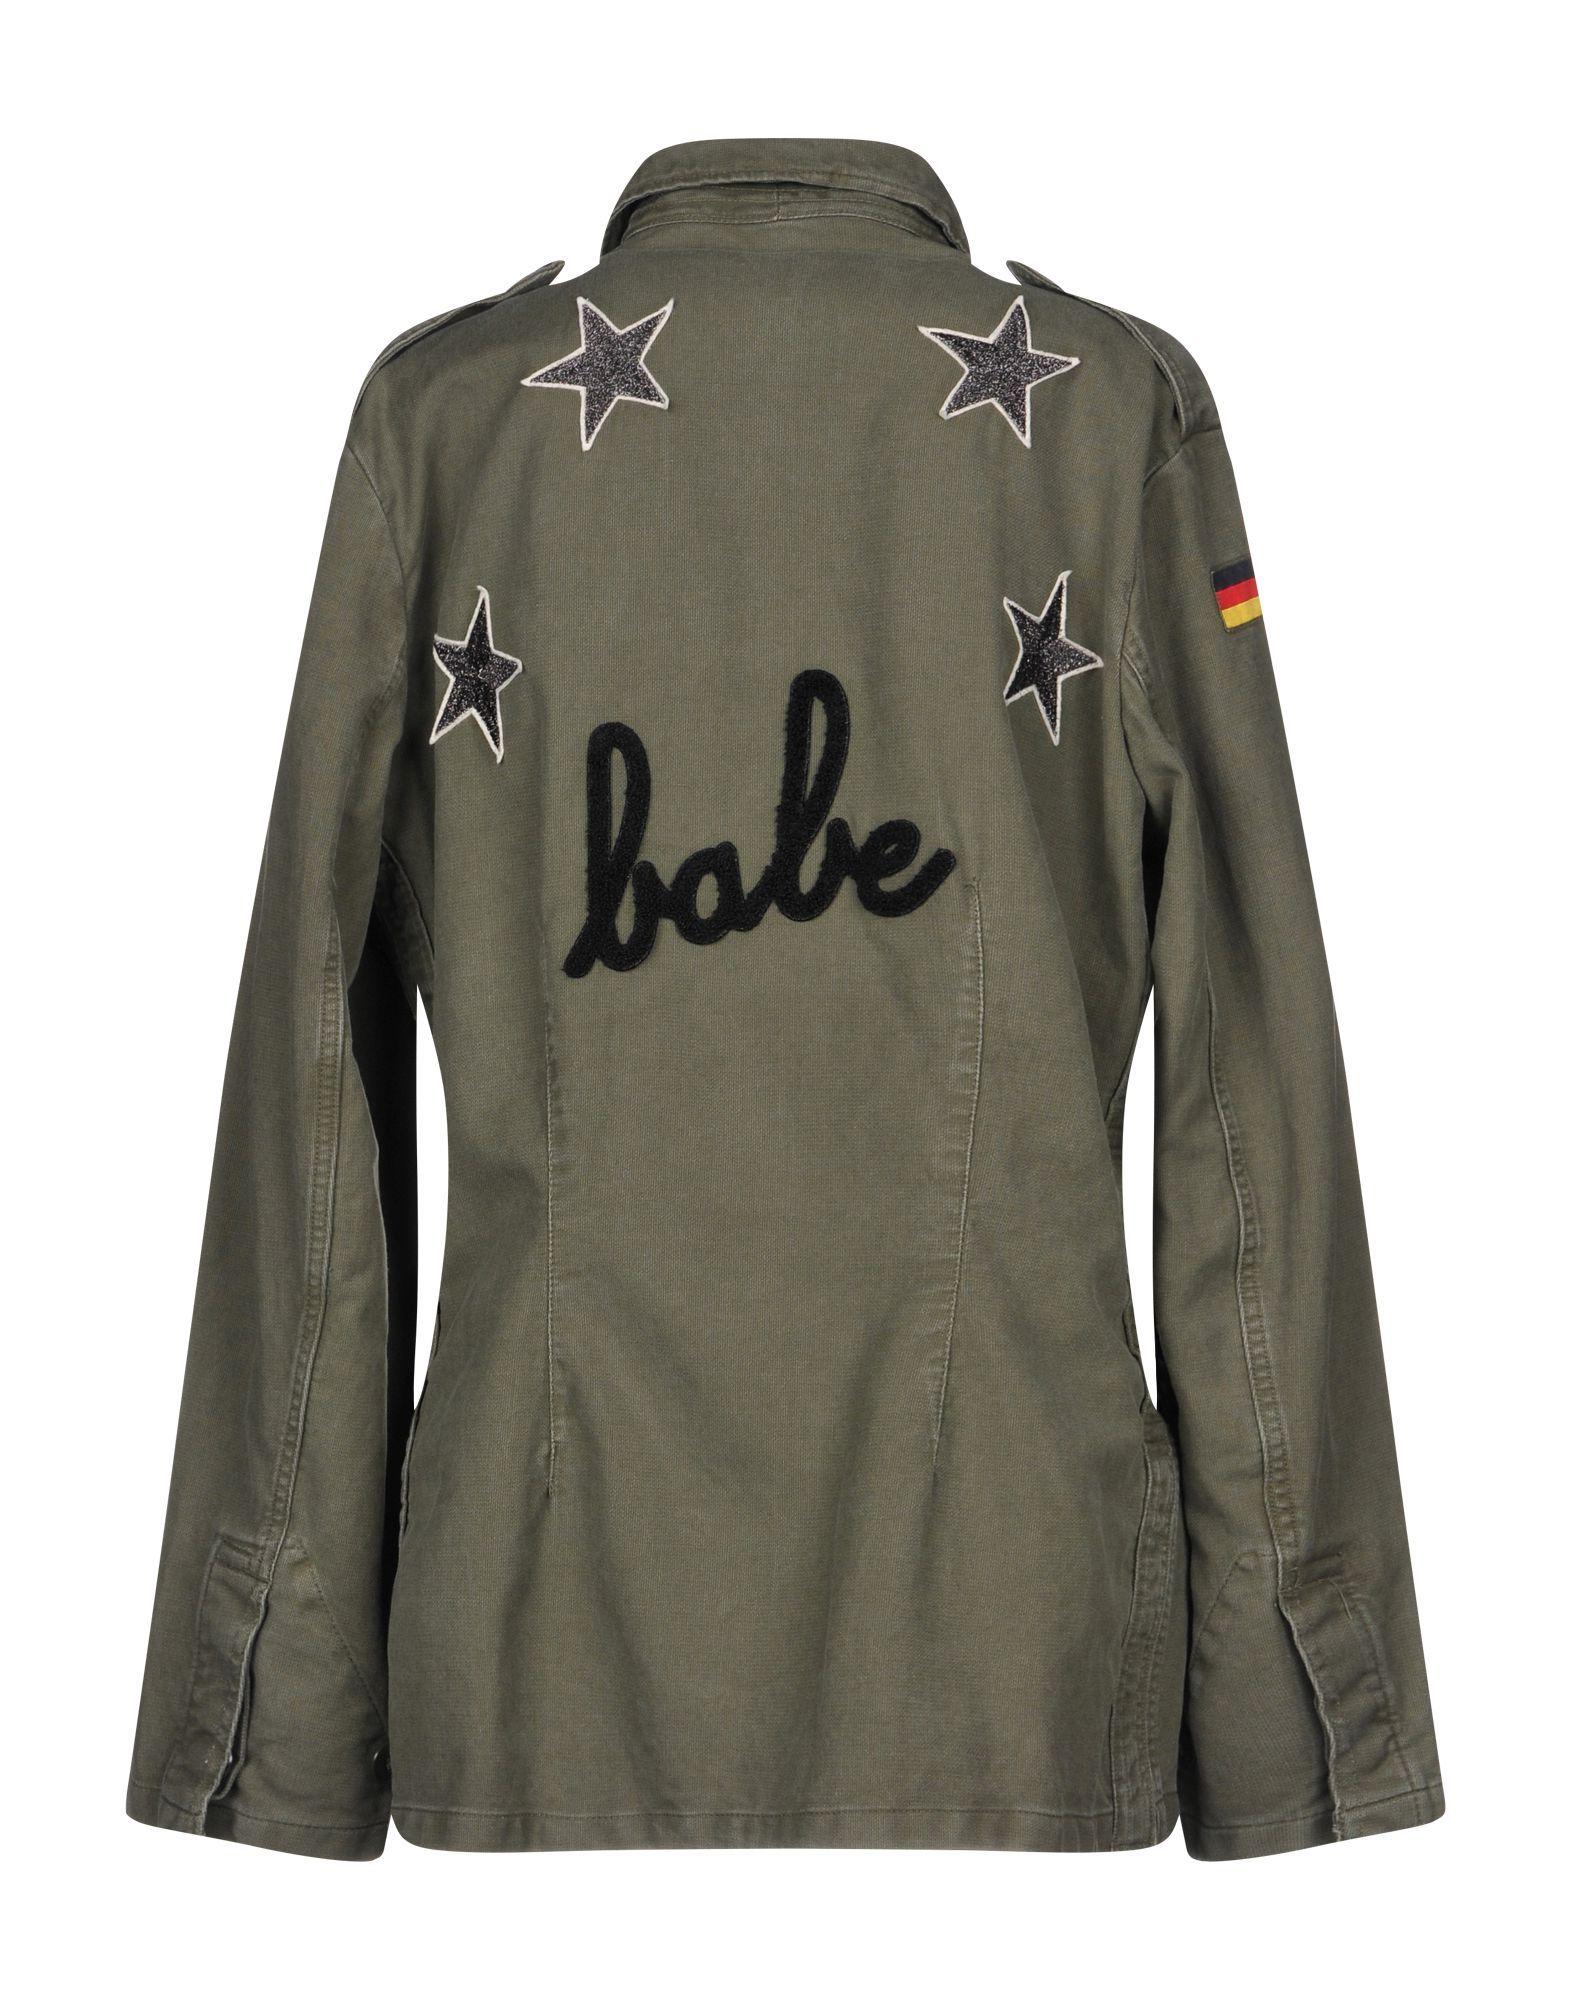 Coat & Jackets Mpd Box Military Green Women's Cotton